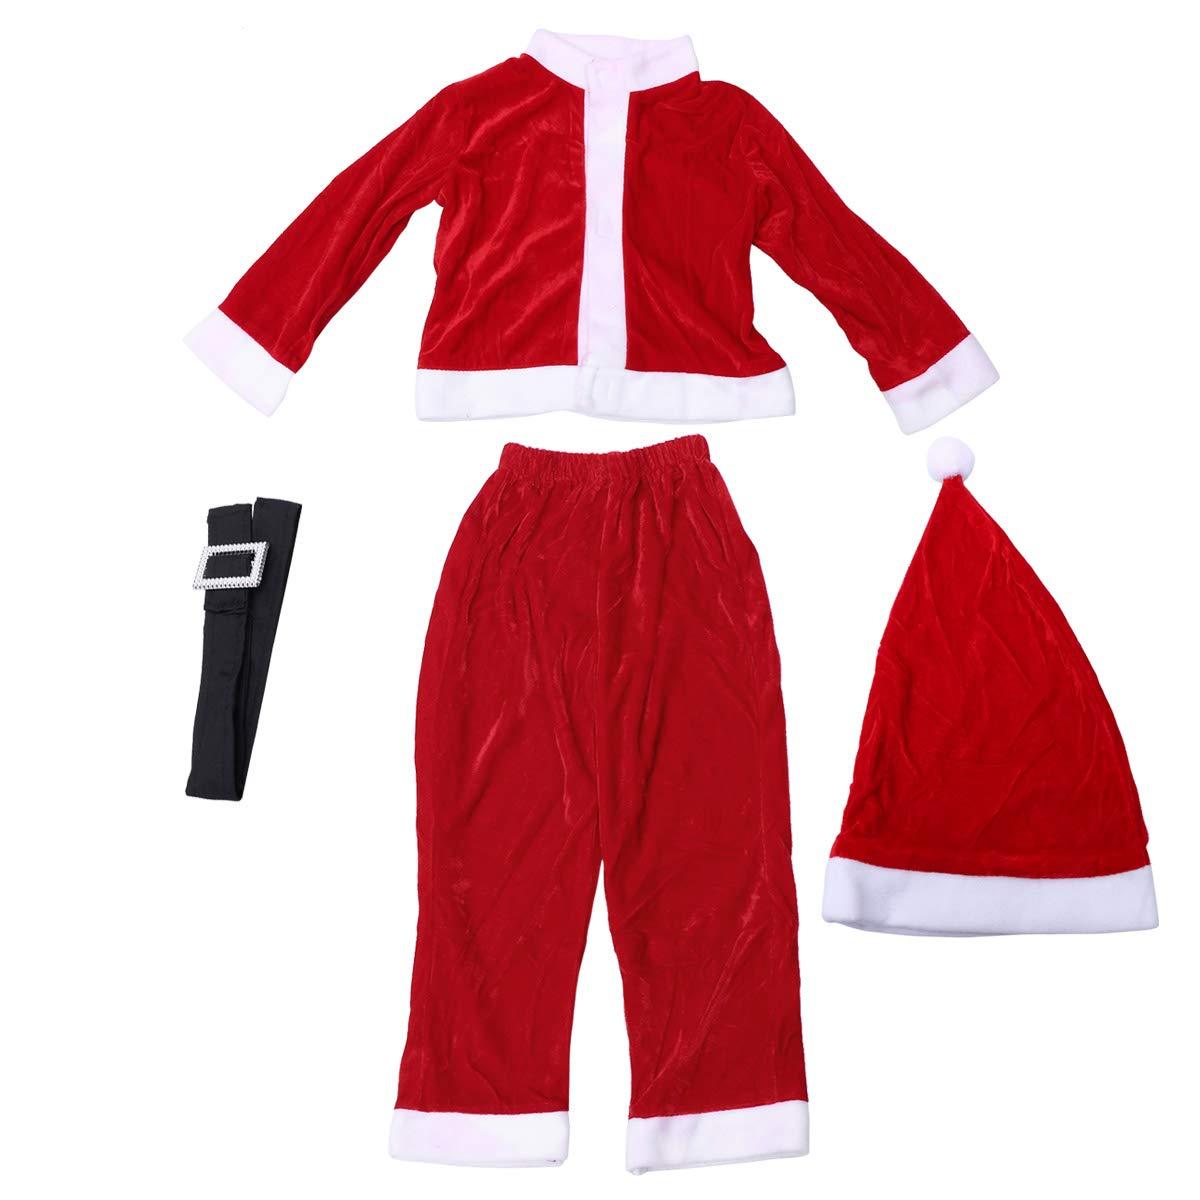 Amazon.com: BESTOYARD Christmas Santa Claus Costume hat ...